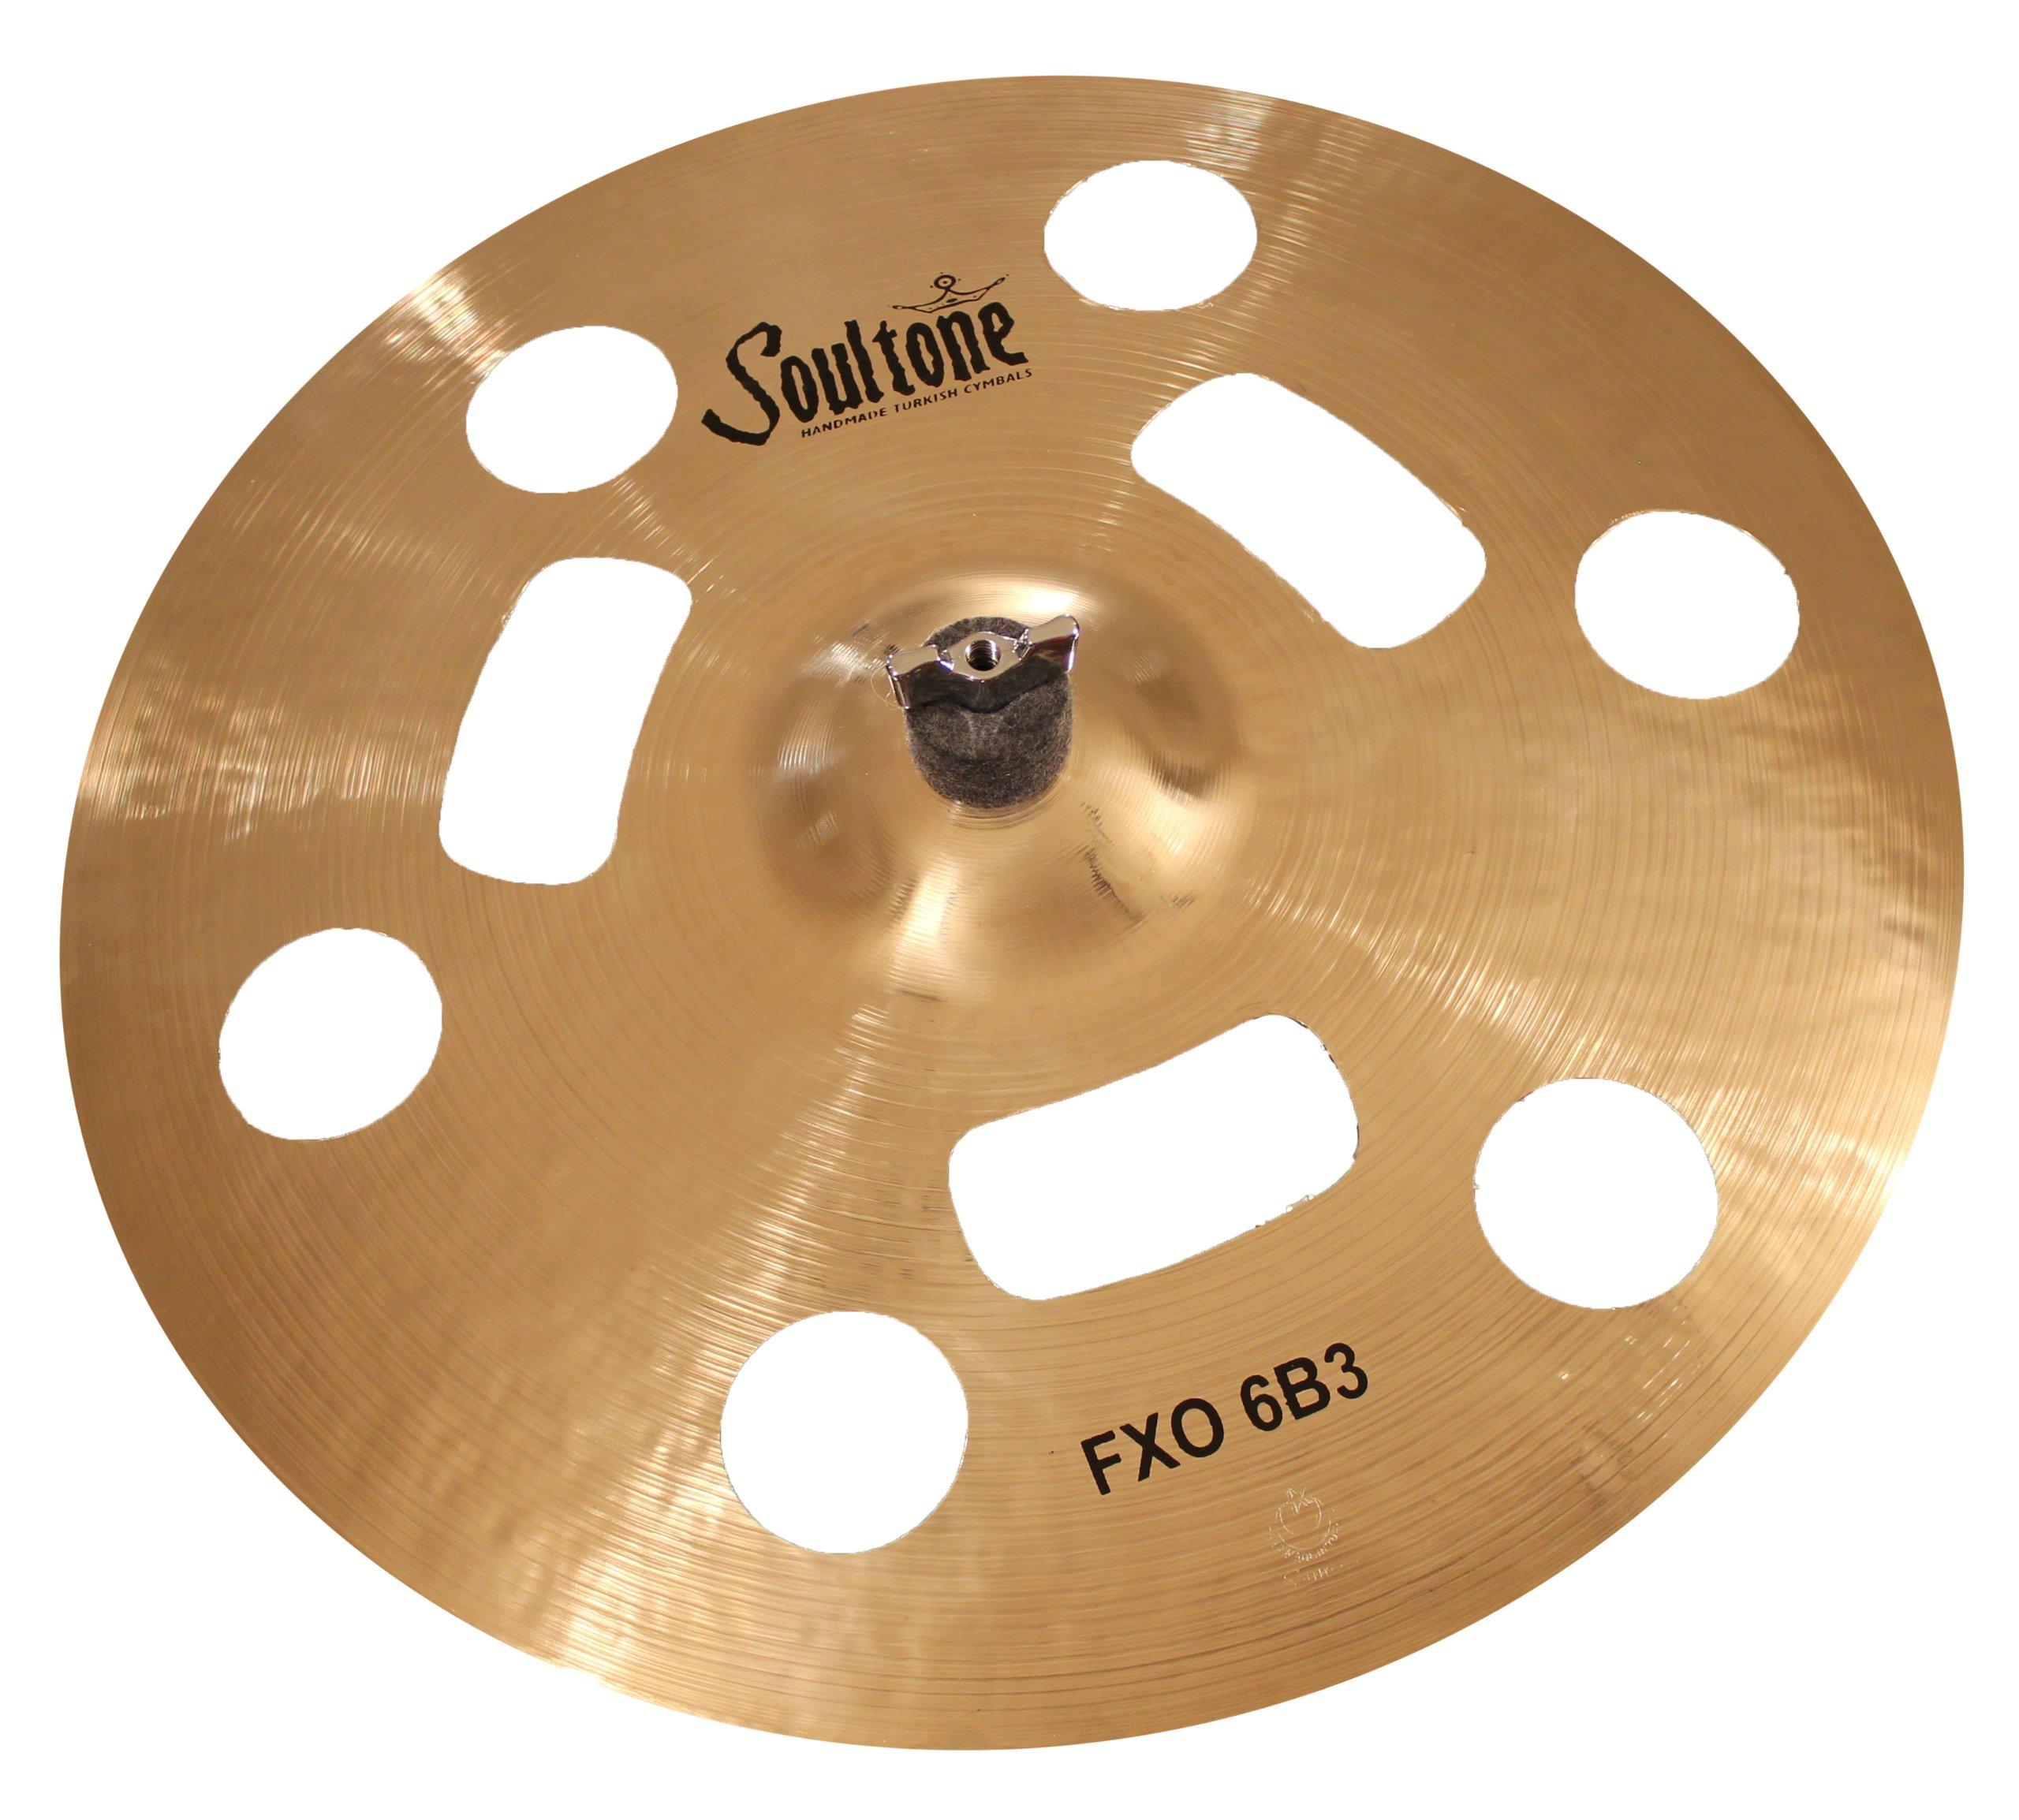 Soultone Cymbals F6B3-FXO22-22'' FXO 6B3 Crash by Soultone Cymbals